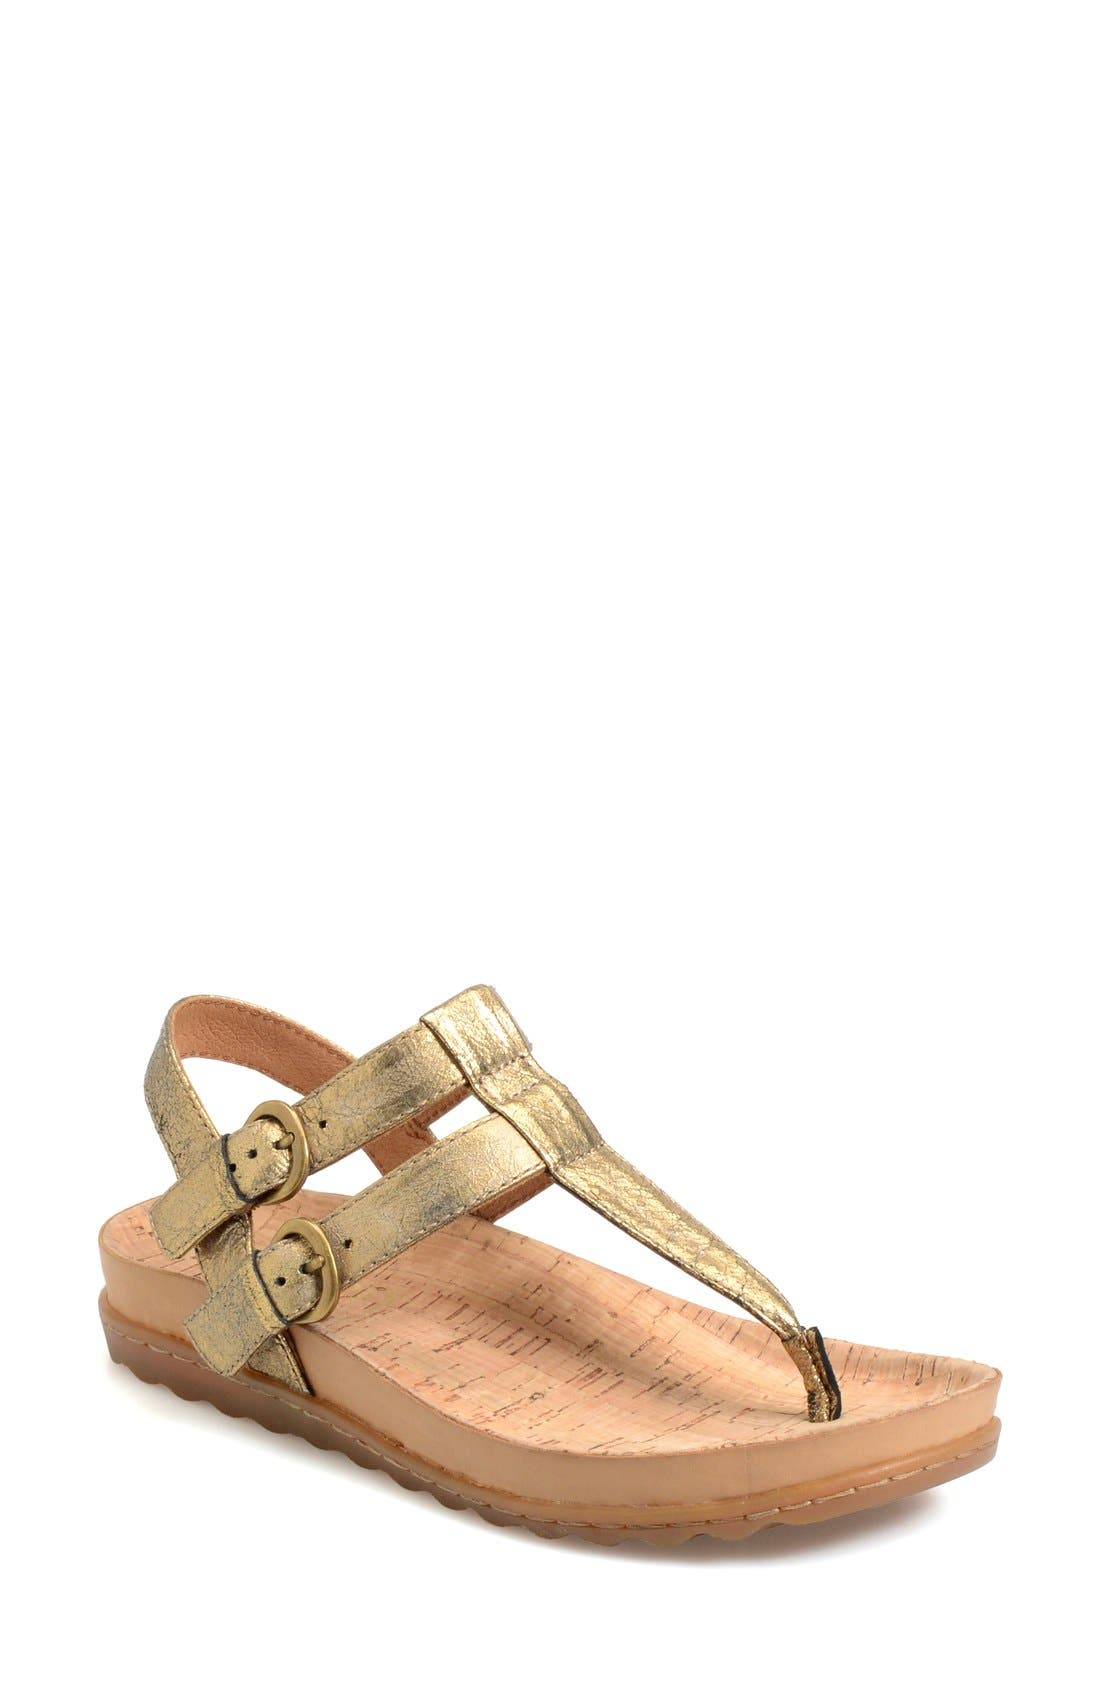 Alternate Image 1 Selected - Børn 'Reta' Leather Thong Sandal (Women)